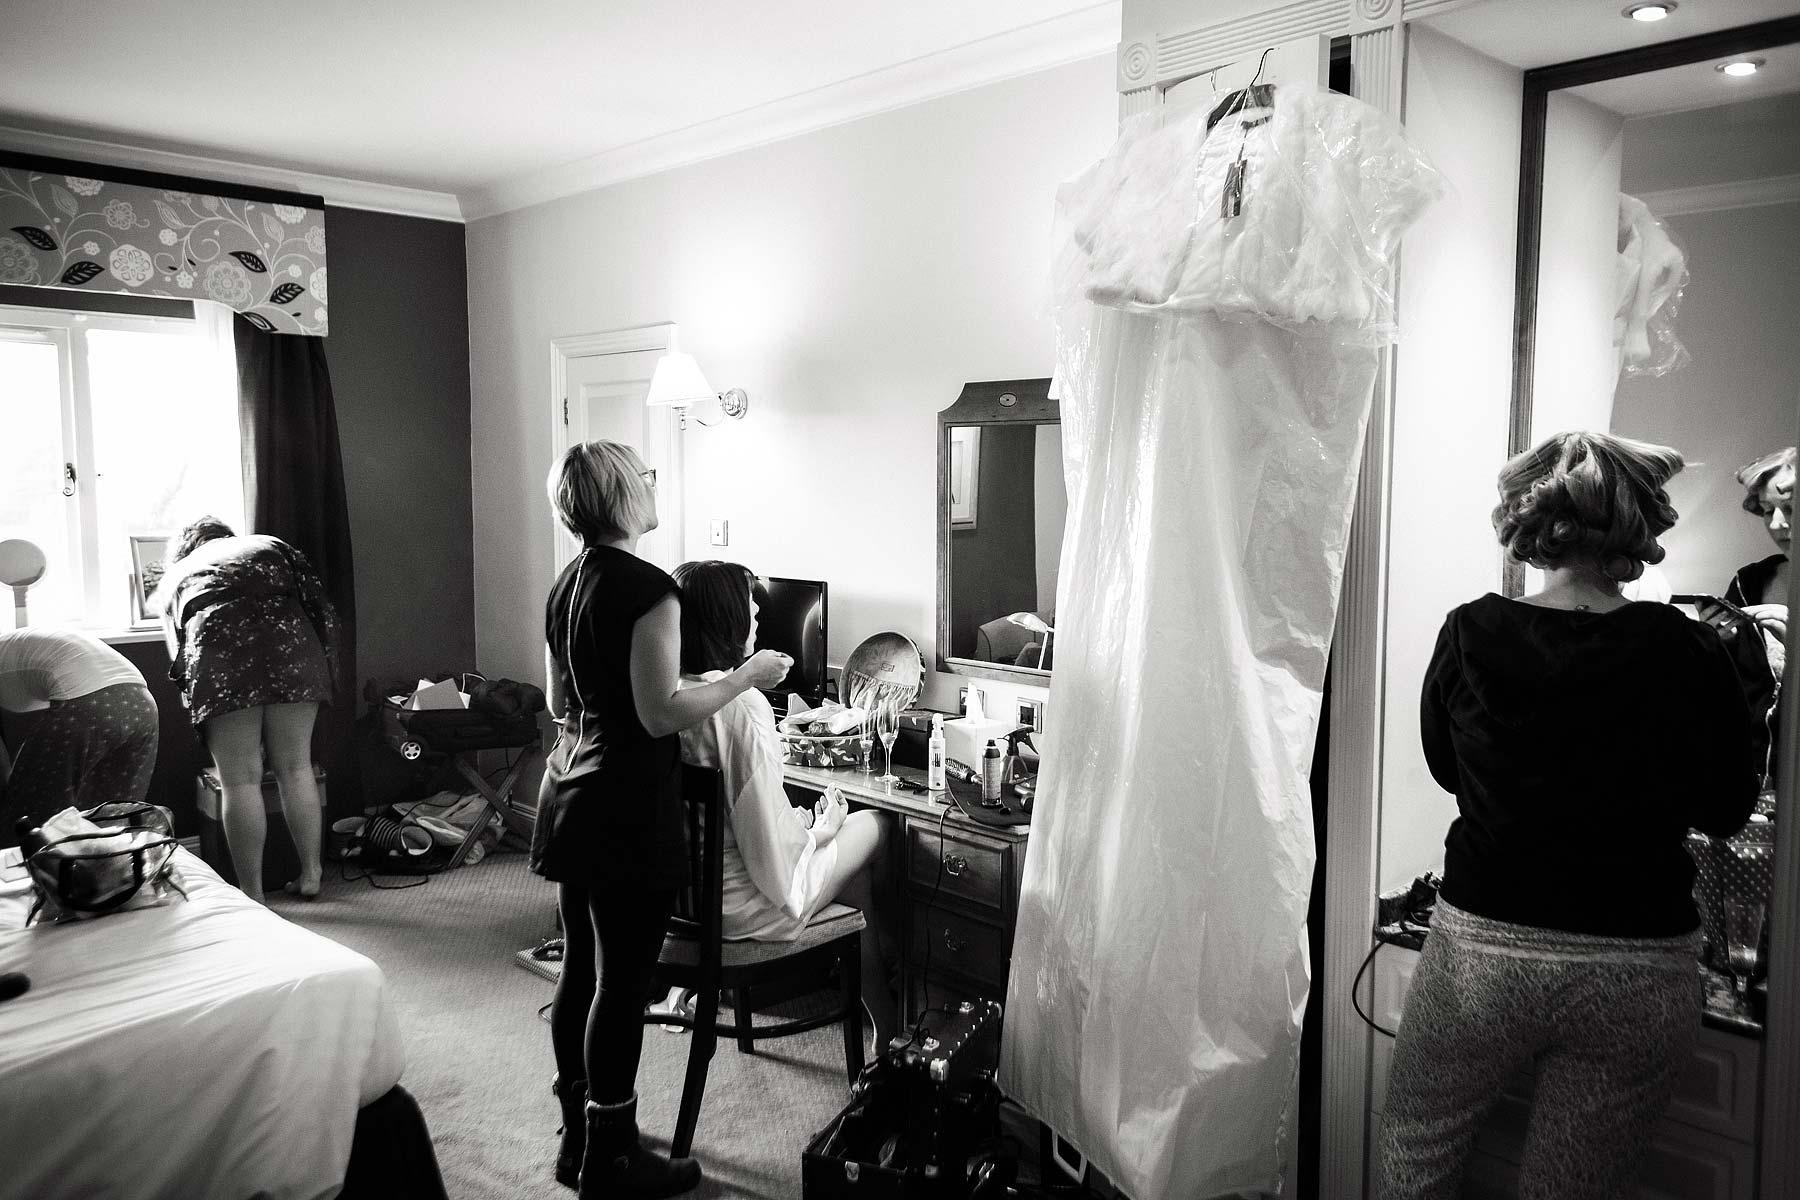 moat-house-winter-wedding-photography-007